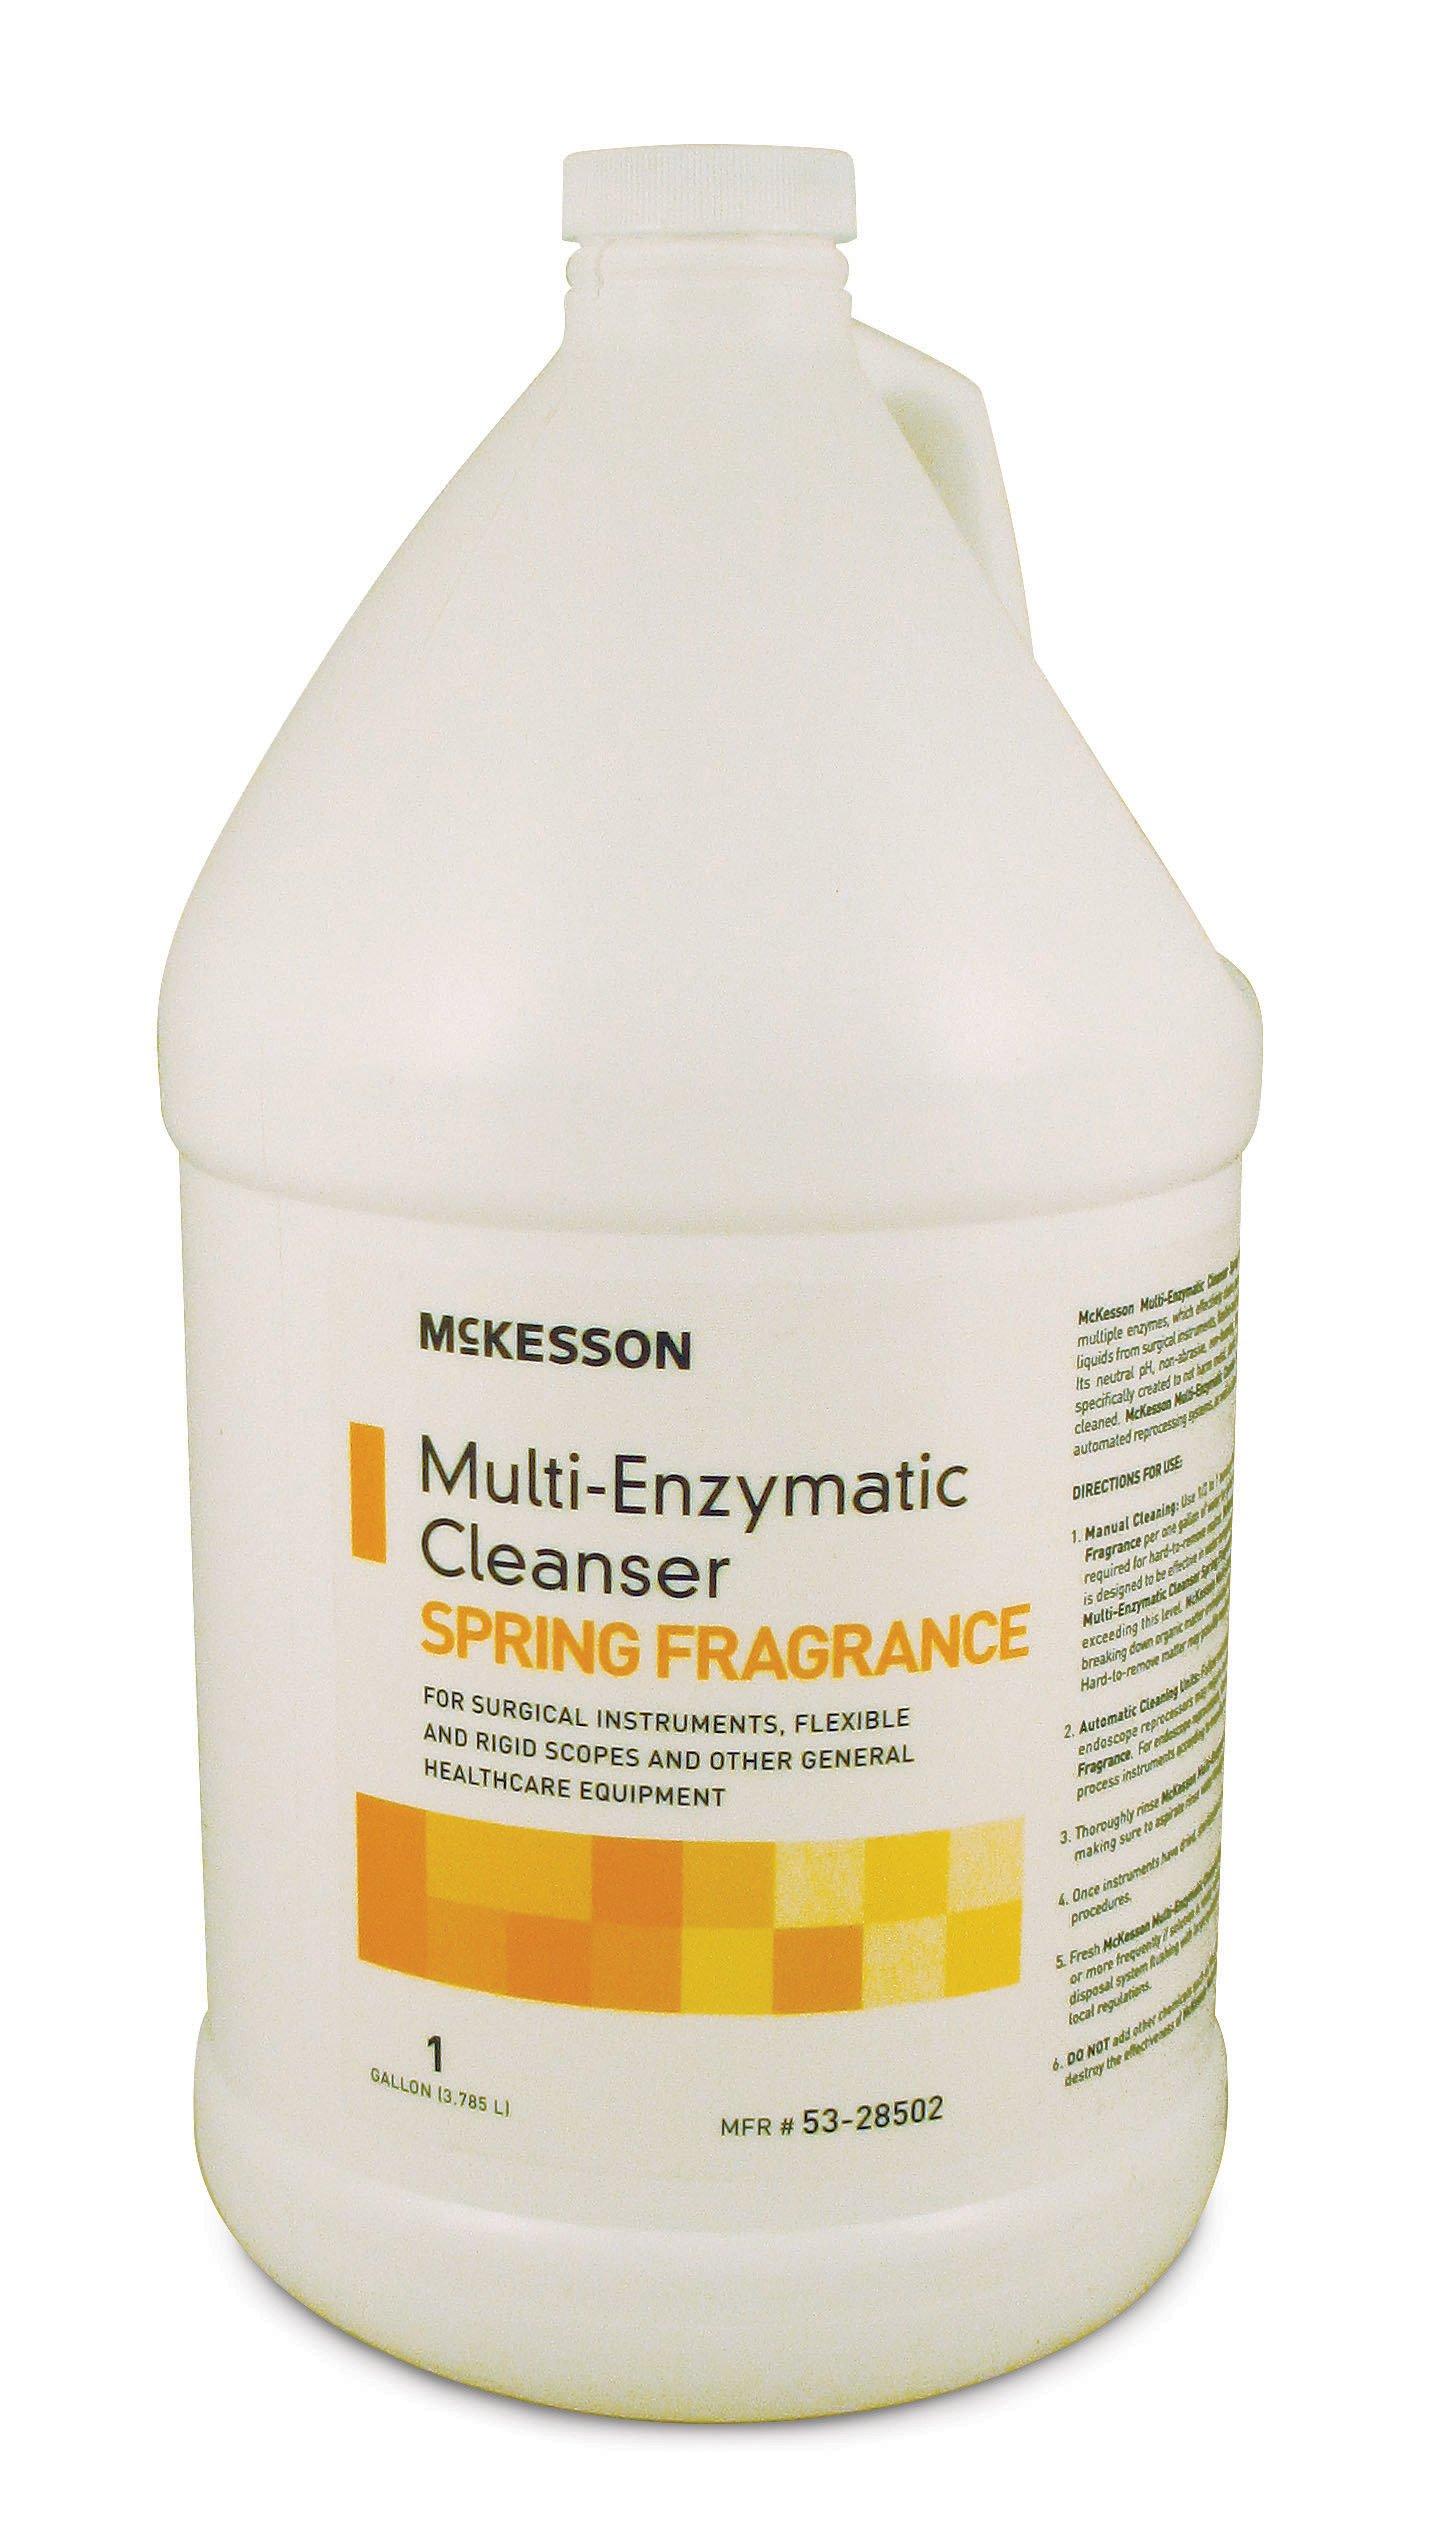 Multi-Enzymatic Instrument Detergent, McKesson, Liquid 1 gal. Jug Spring Fresh Scent, 53-28502 - EACH